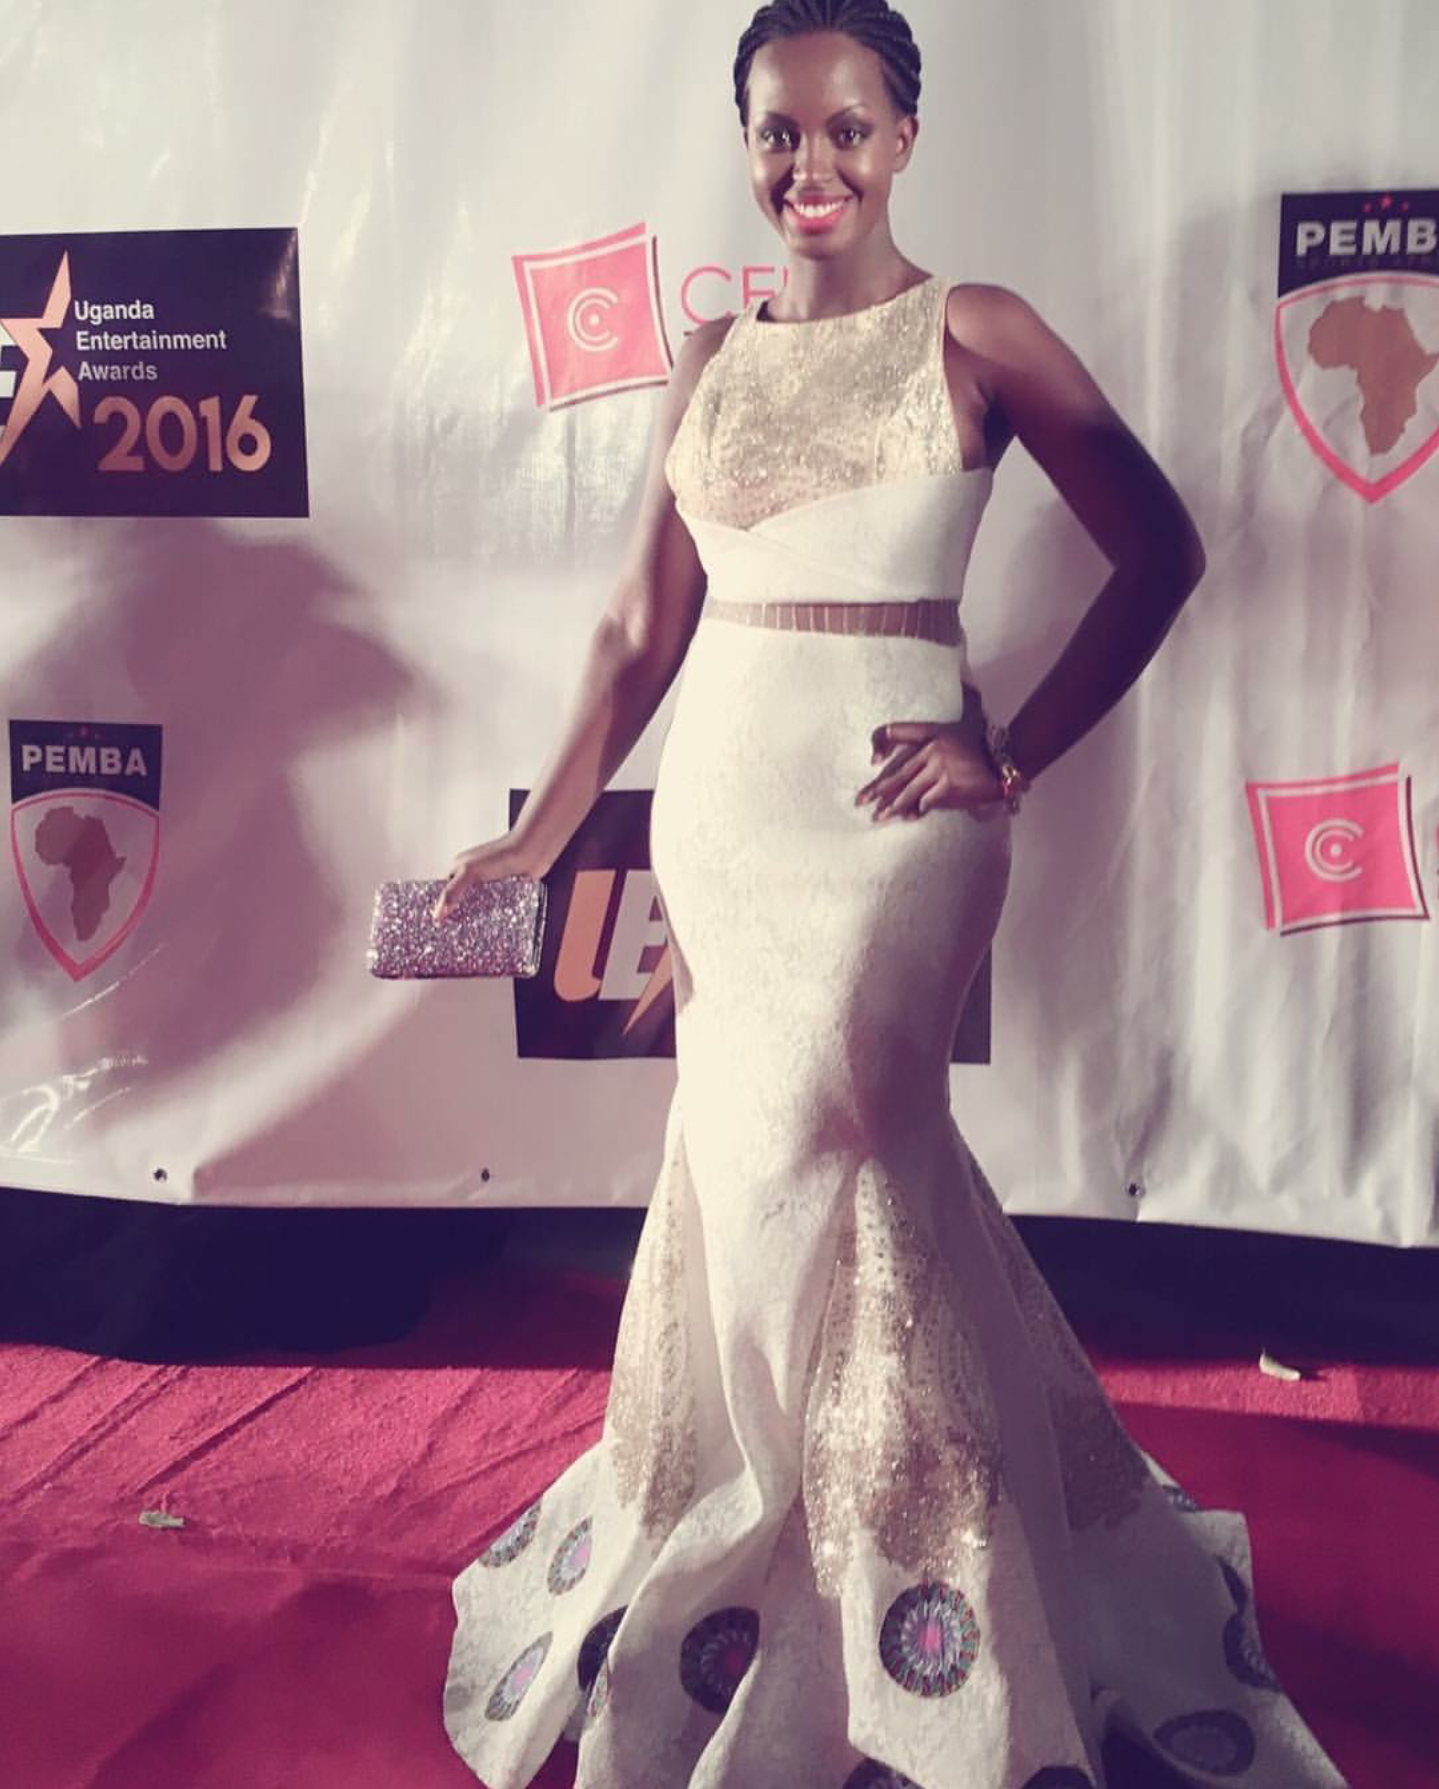 flavia-ugandan-entertainmnt-awards-yaasomuah